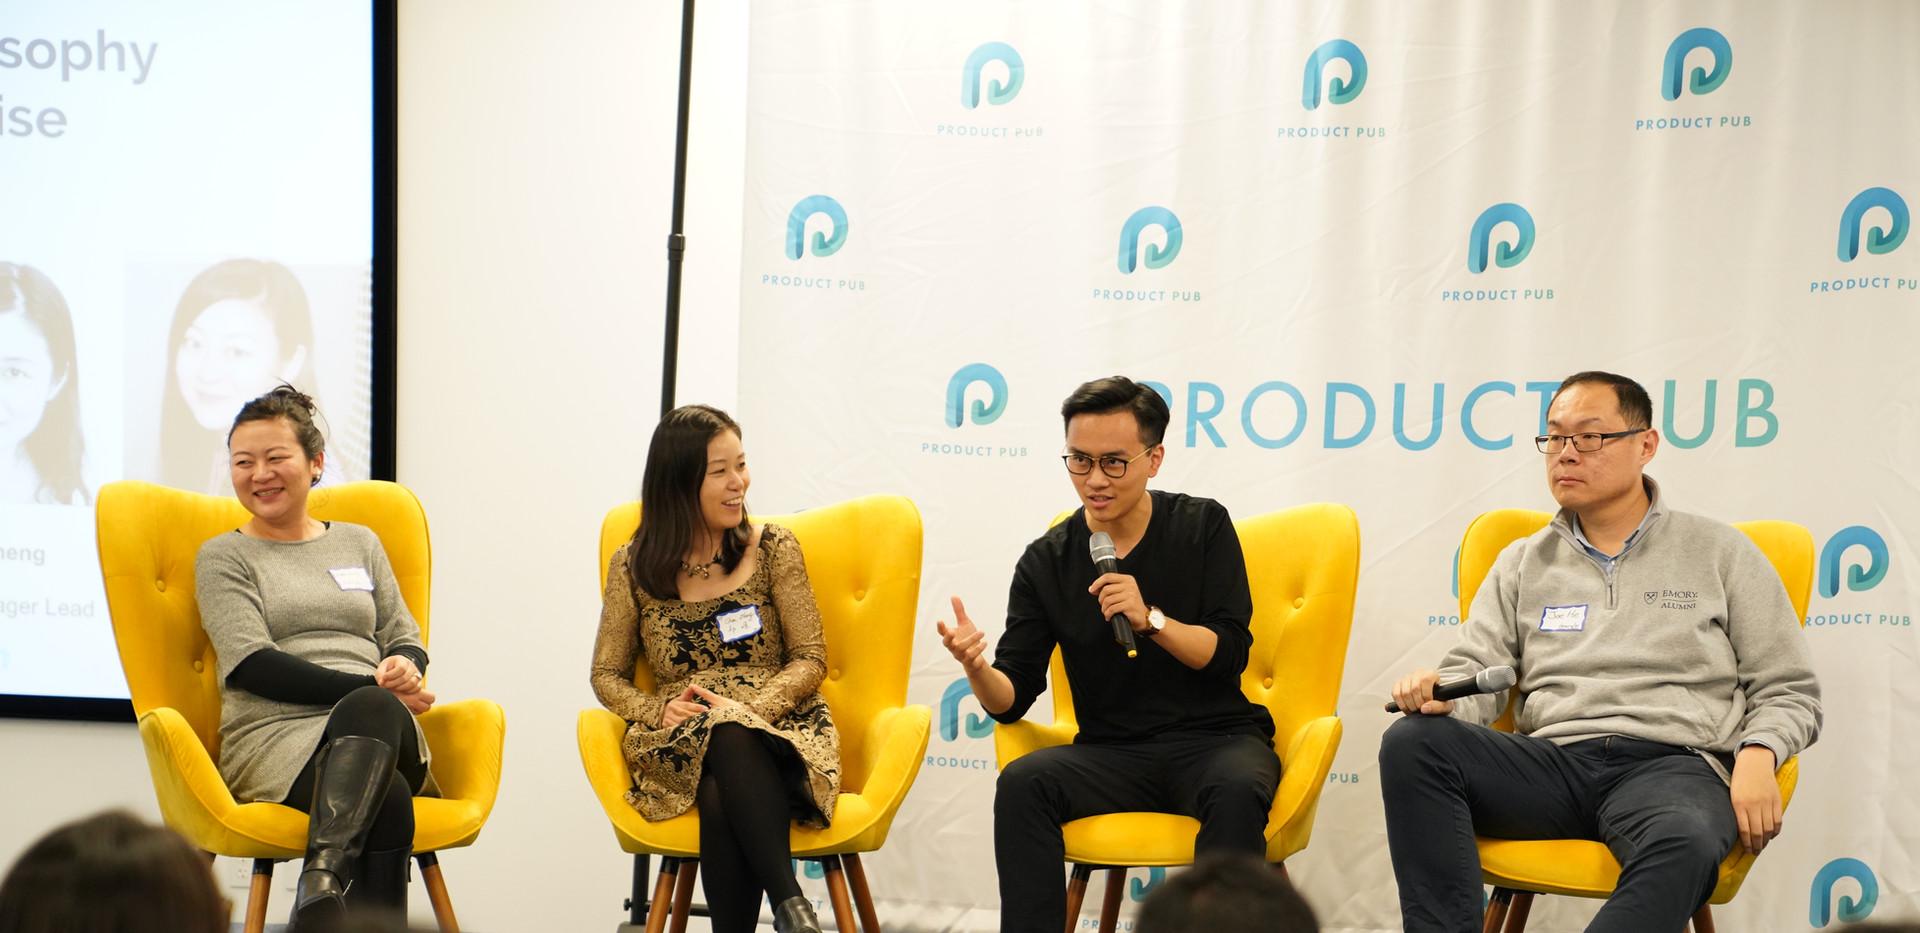 Product-Pub-Summit-2018-11